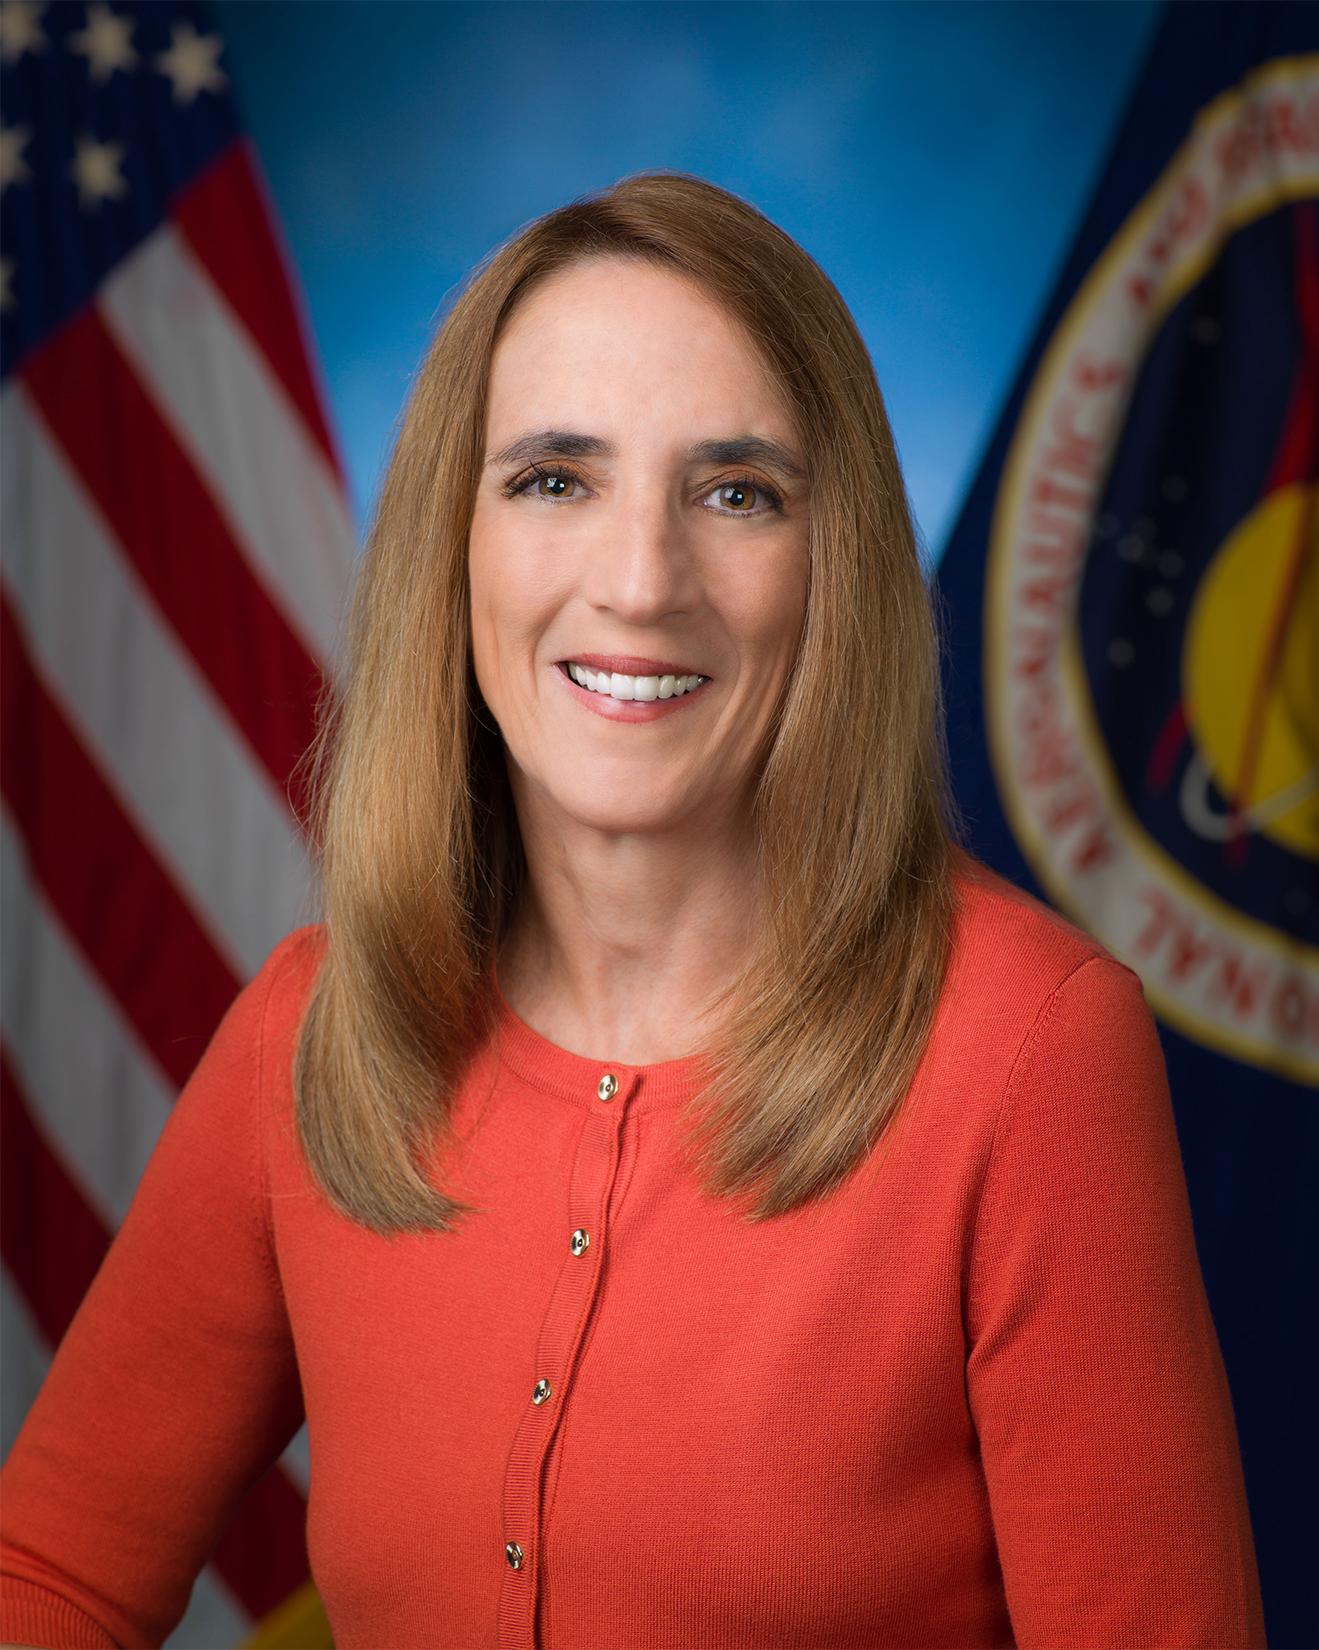 Dr. Nancy Currie-Gregg | NASA Astronaut & Professor of Engineering Practice Texas A&M University